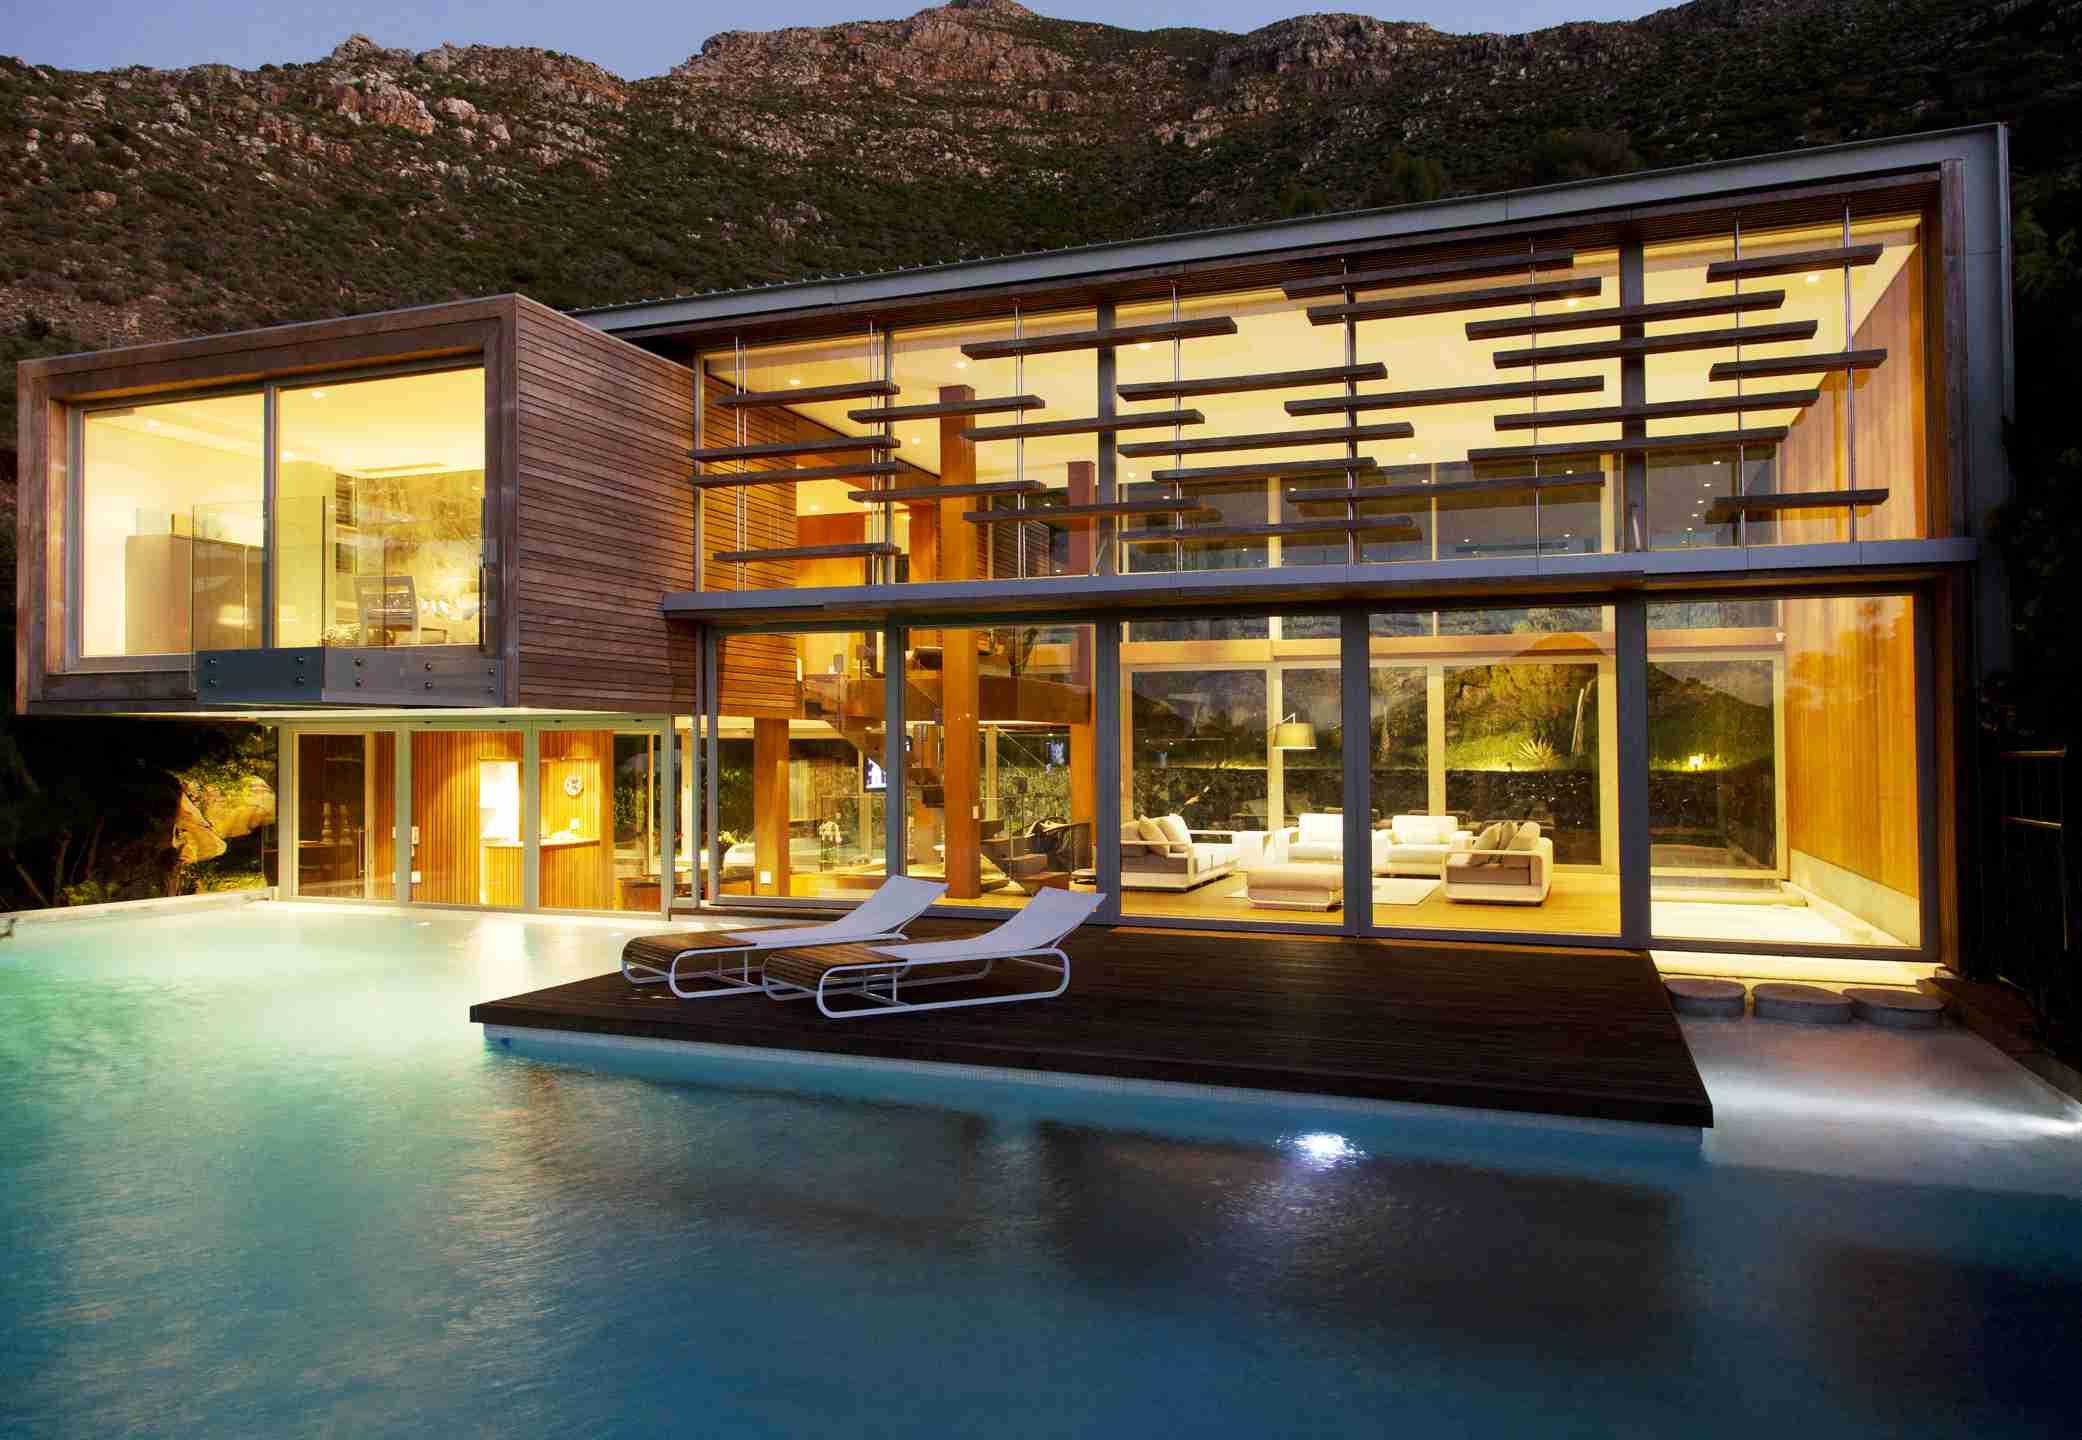 spa house swimming pool